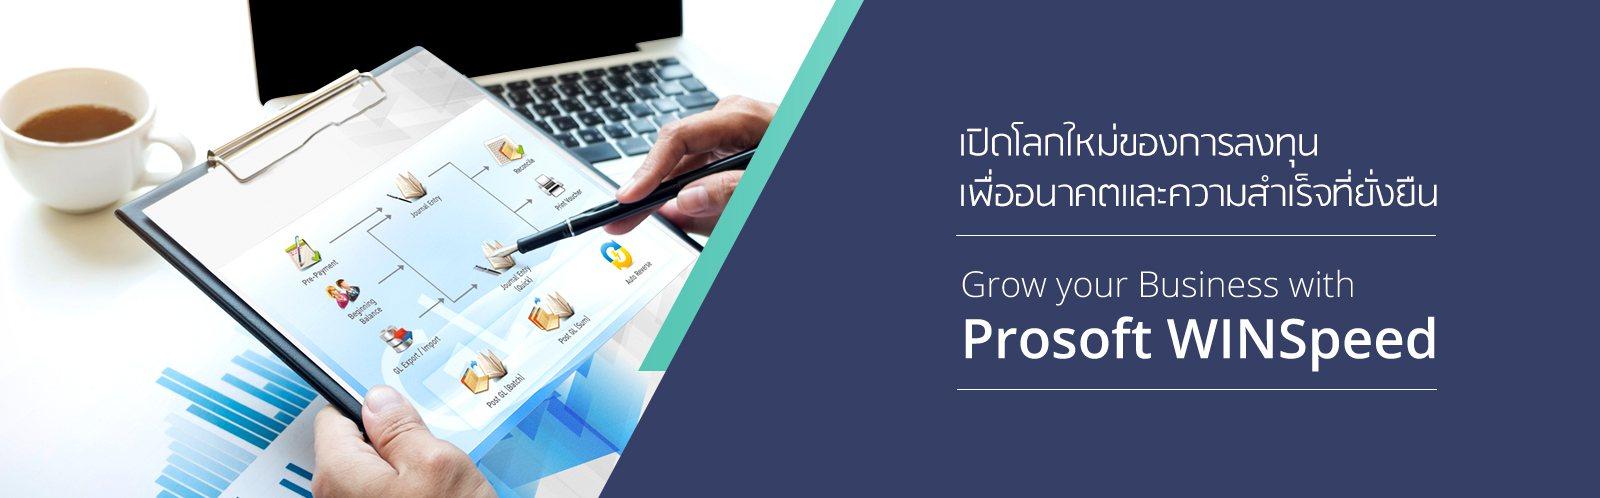 Prosoft WINSpeed